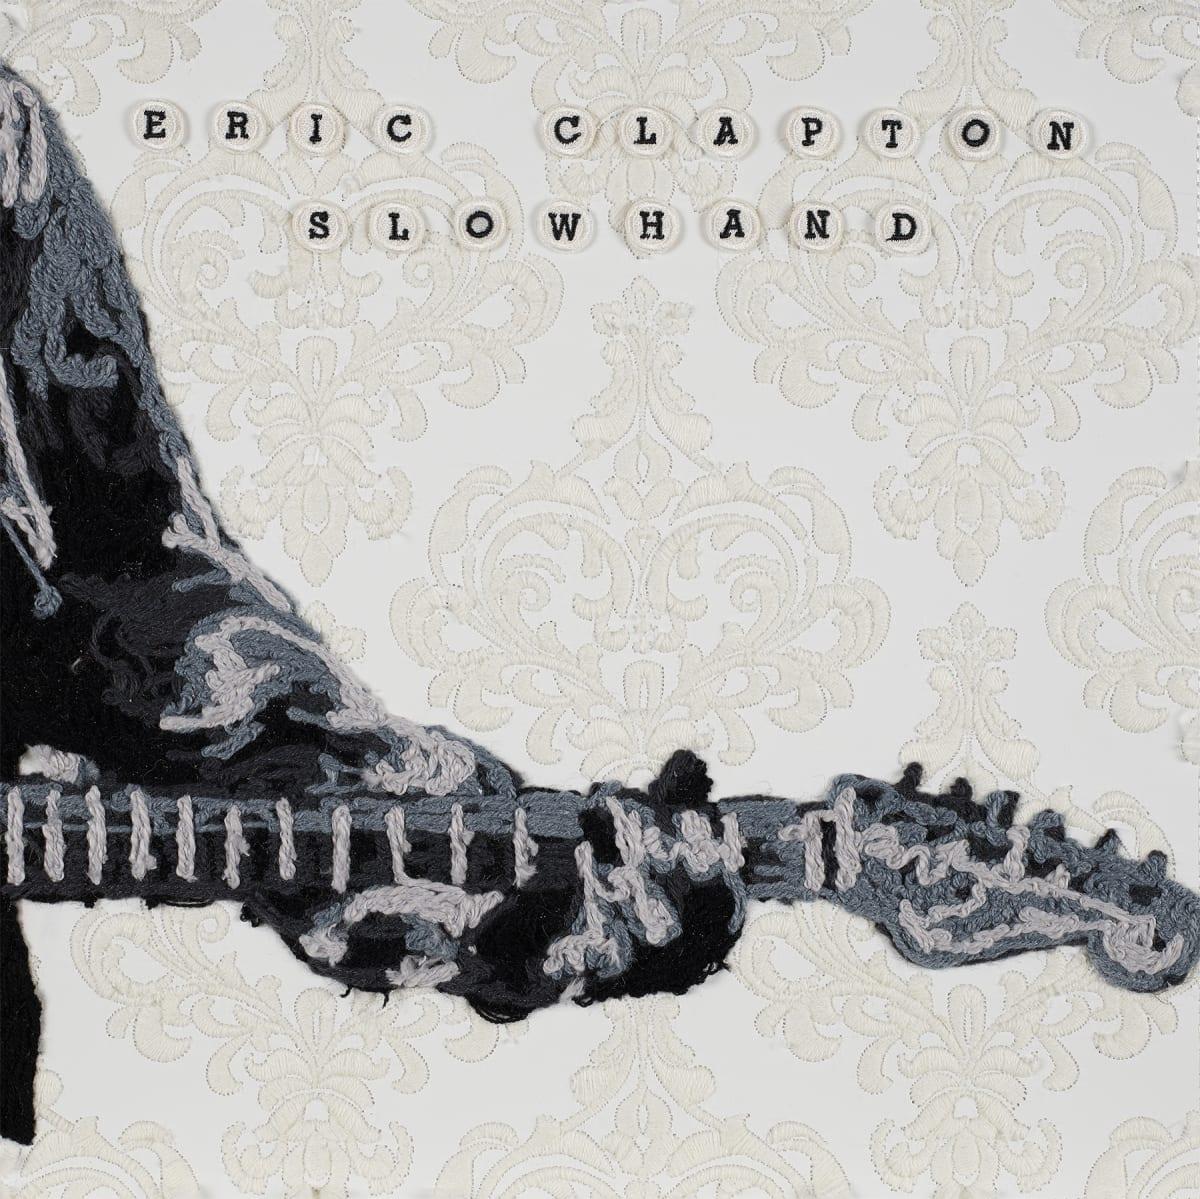 Stephen Wilson, Slow Hand, Eric Clapton, 2020